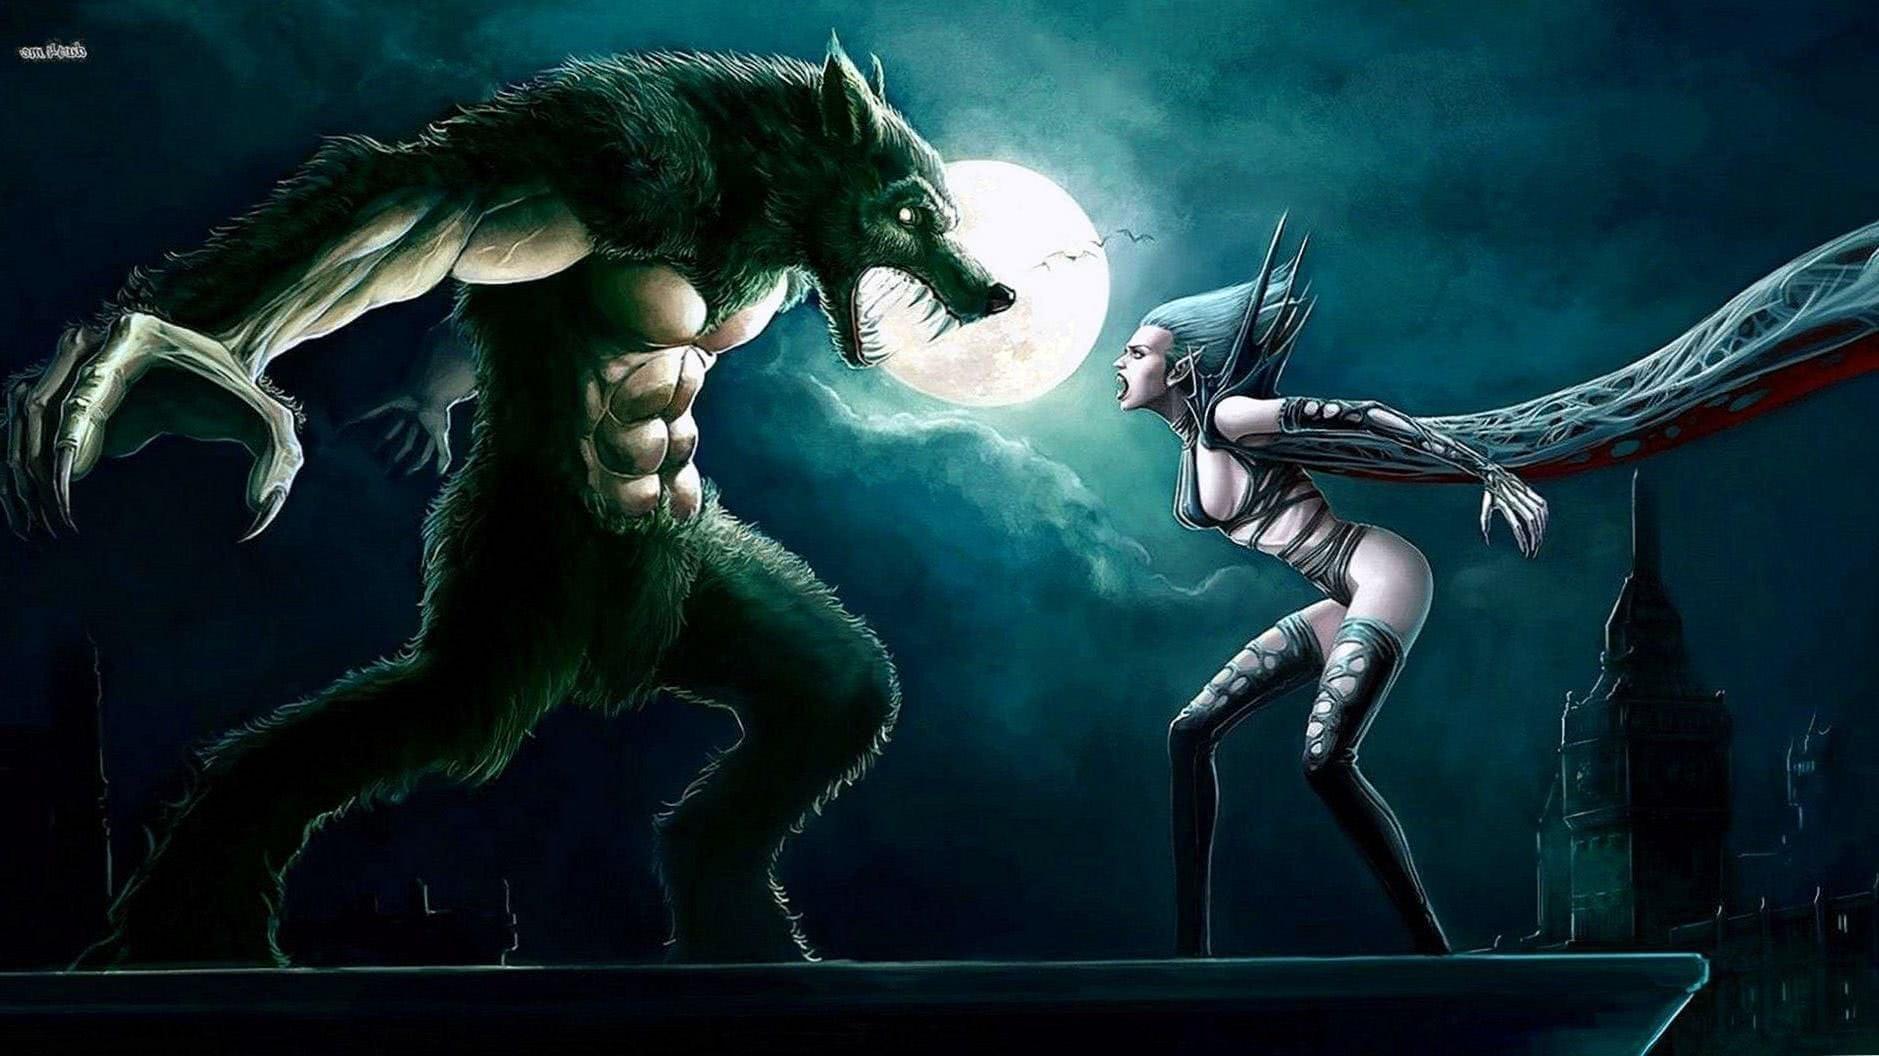 Vampire And Werewolf Wallpapers